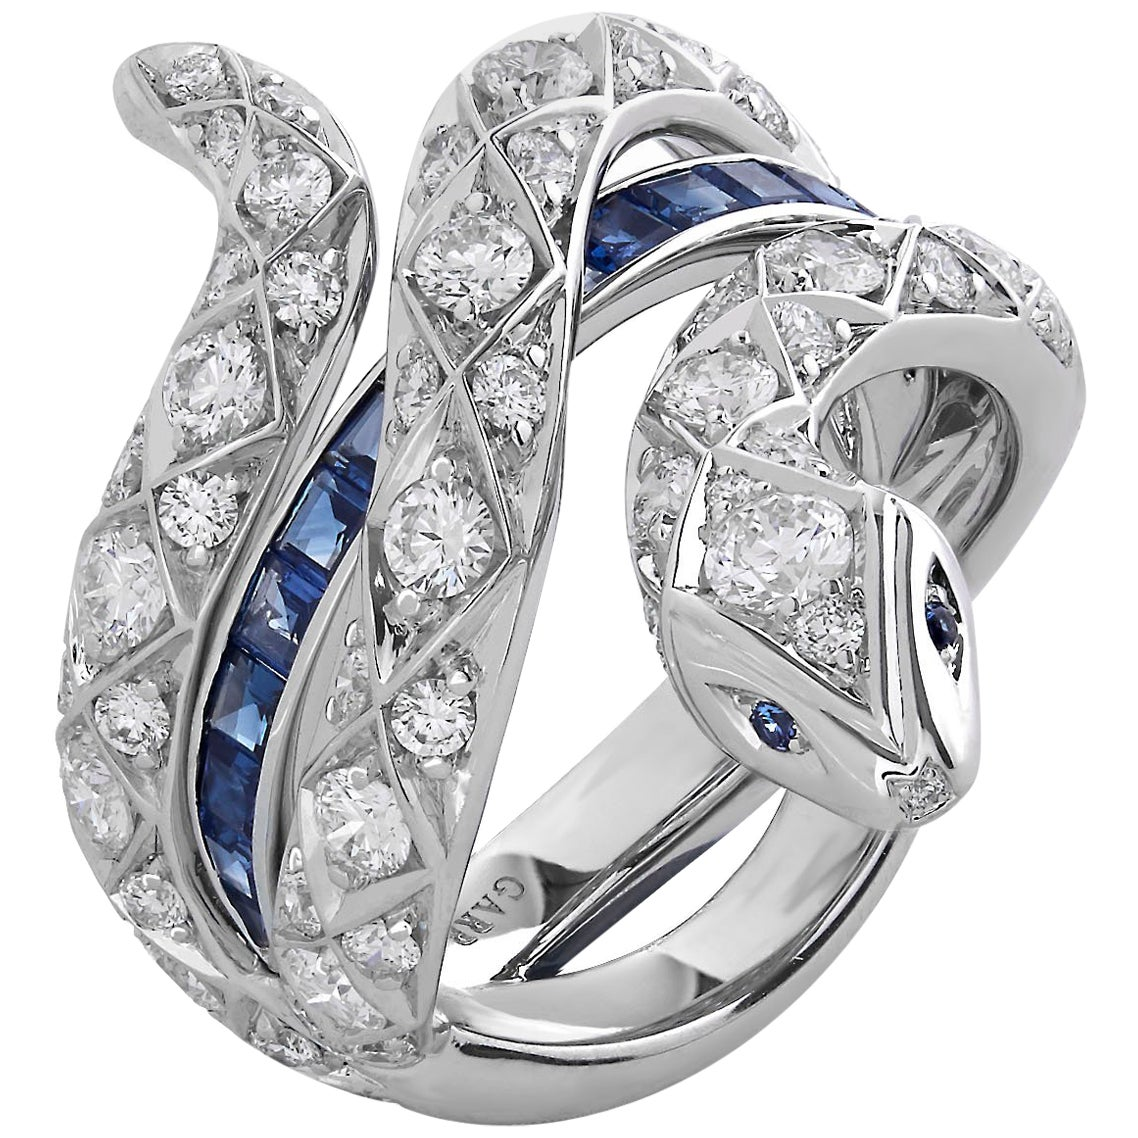 Garrard 'Muse' Signature Serpent 18 Karat White Gold Sapphire and Diamond Ring